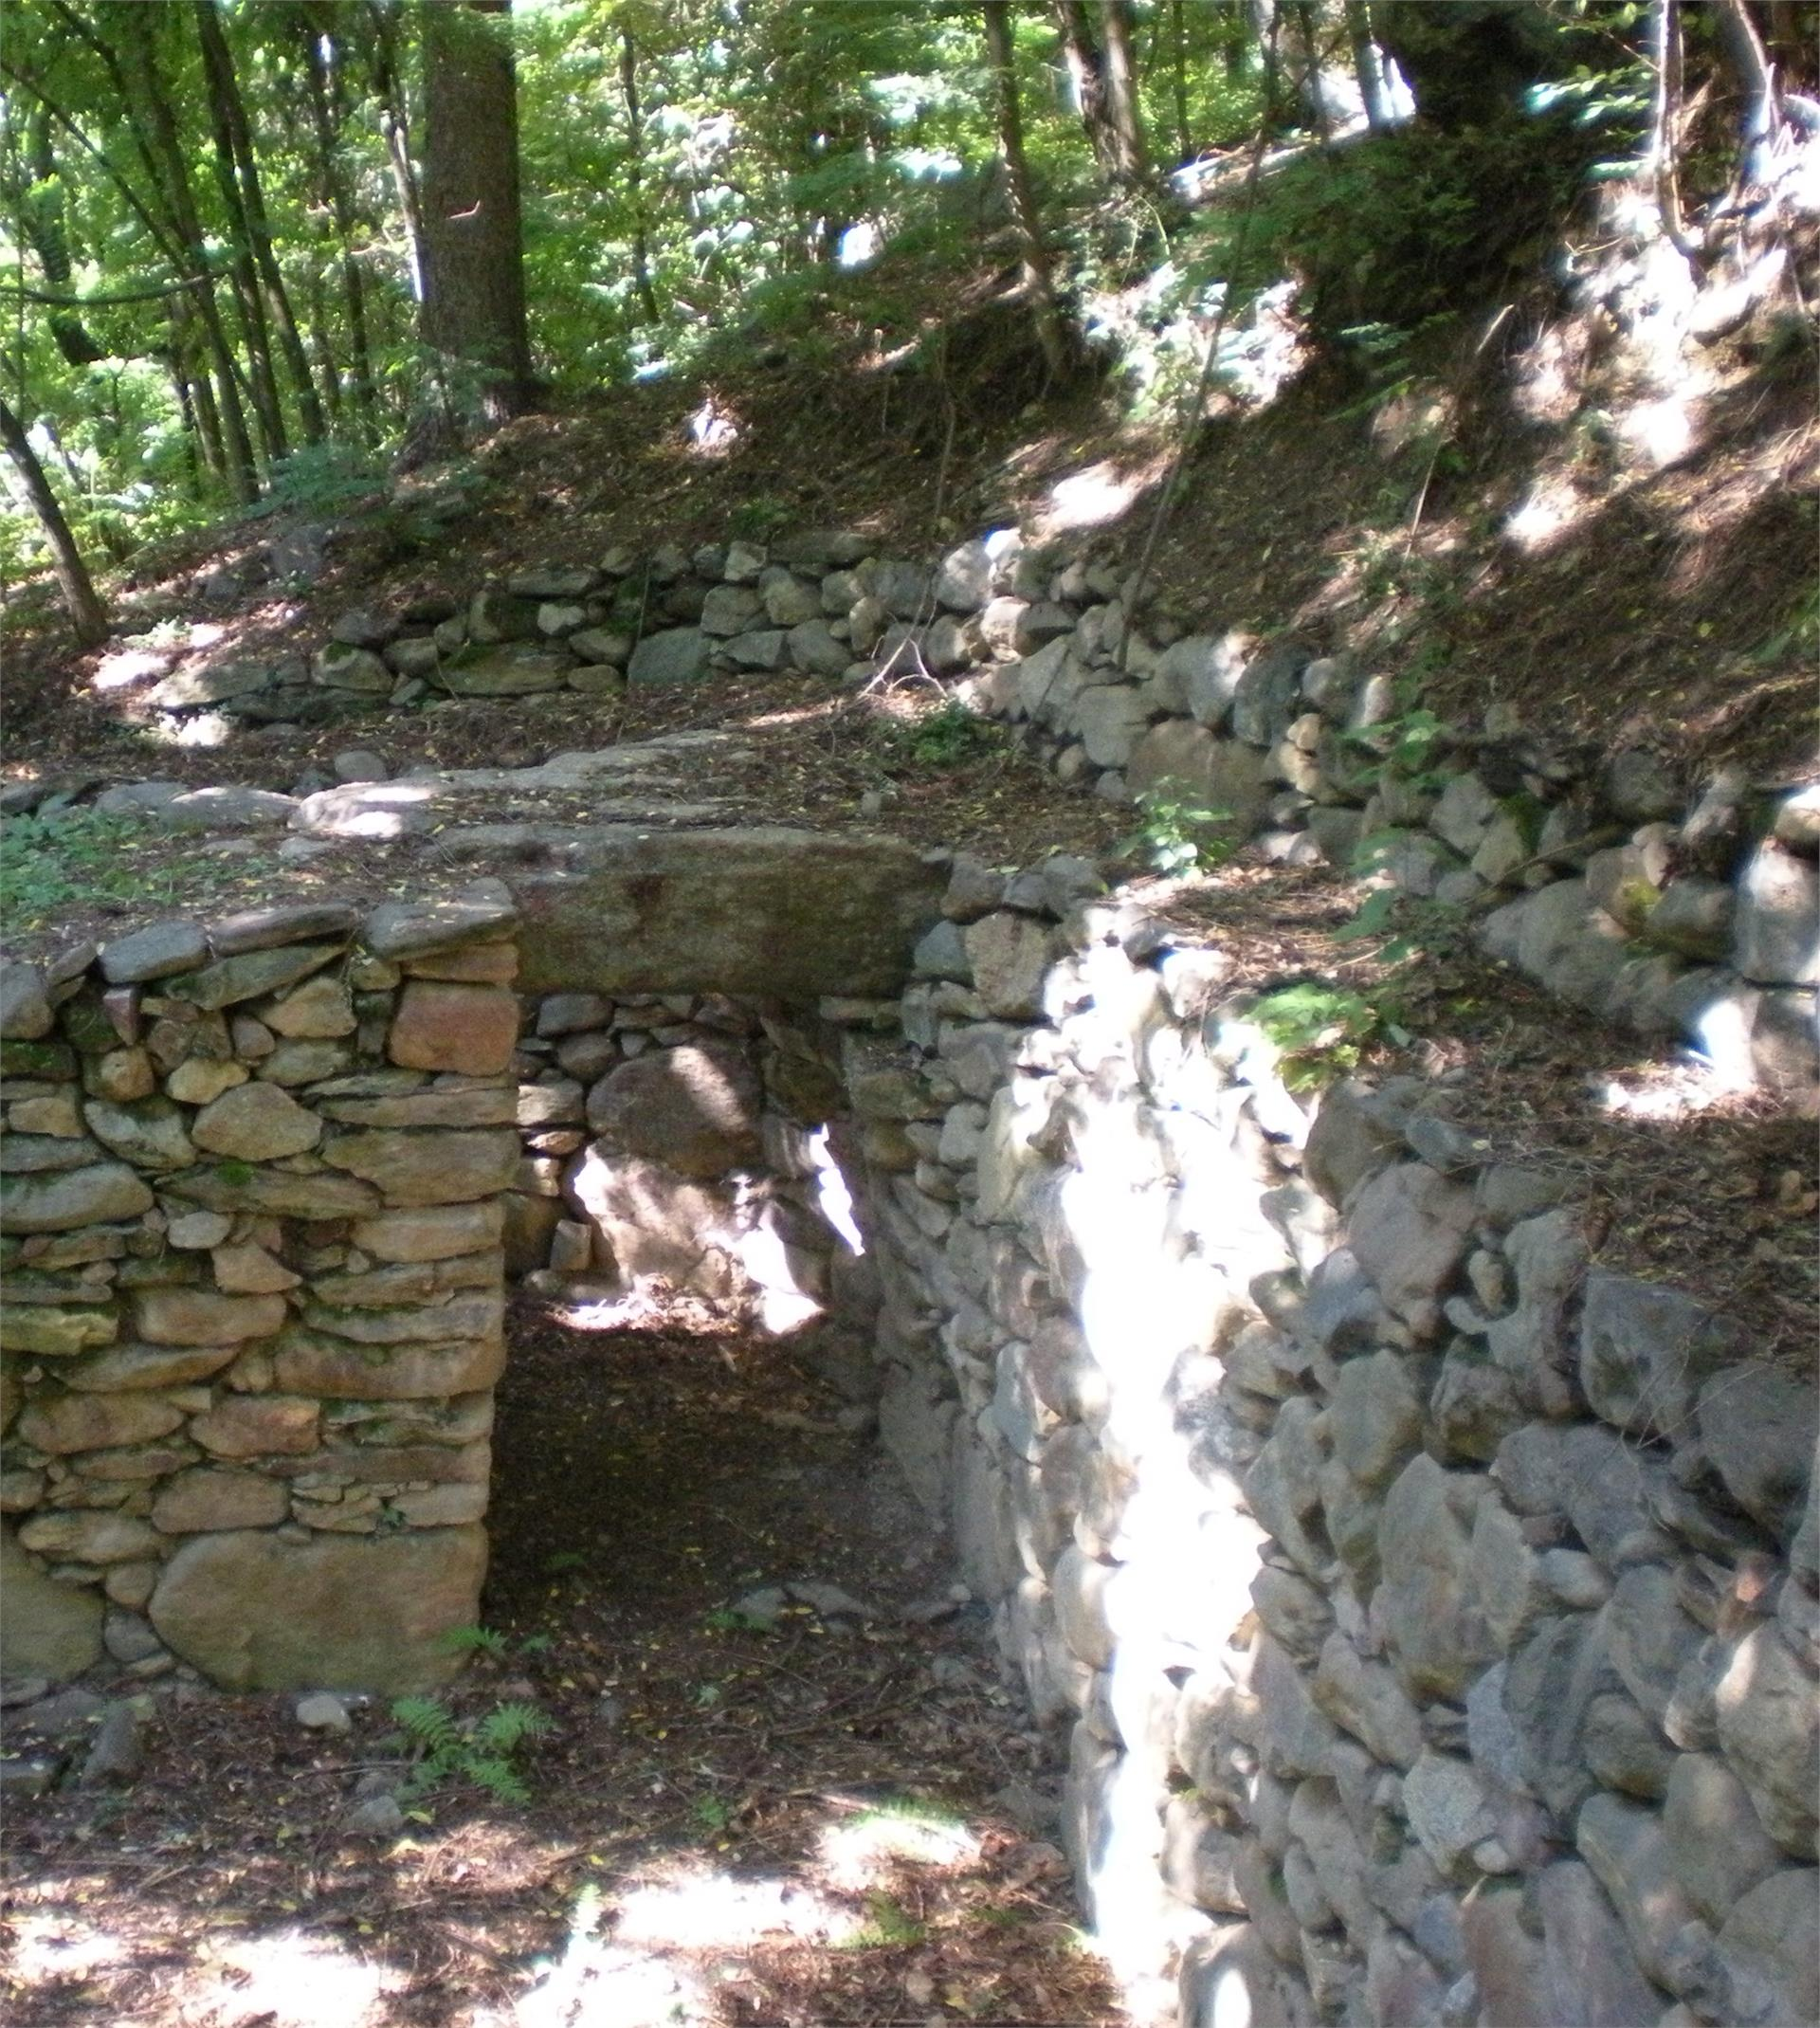 Burgstall Prehistoric Settlement Site in Rifiano/Riffian